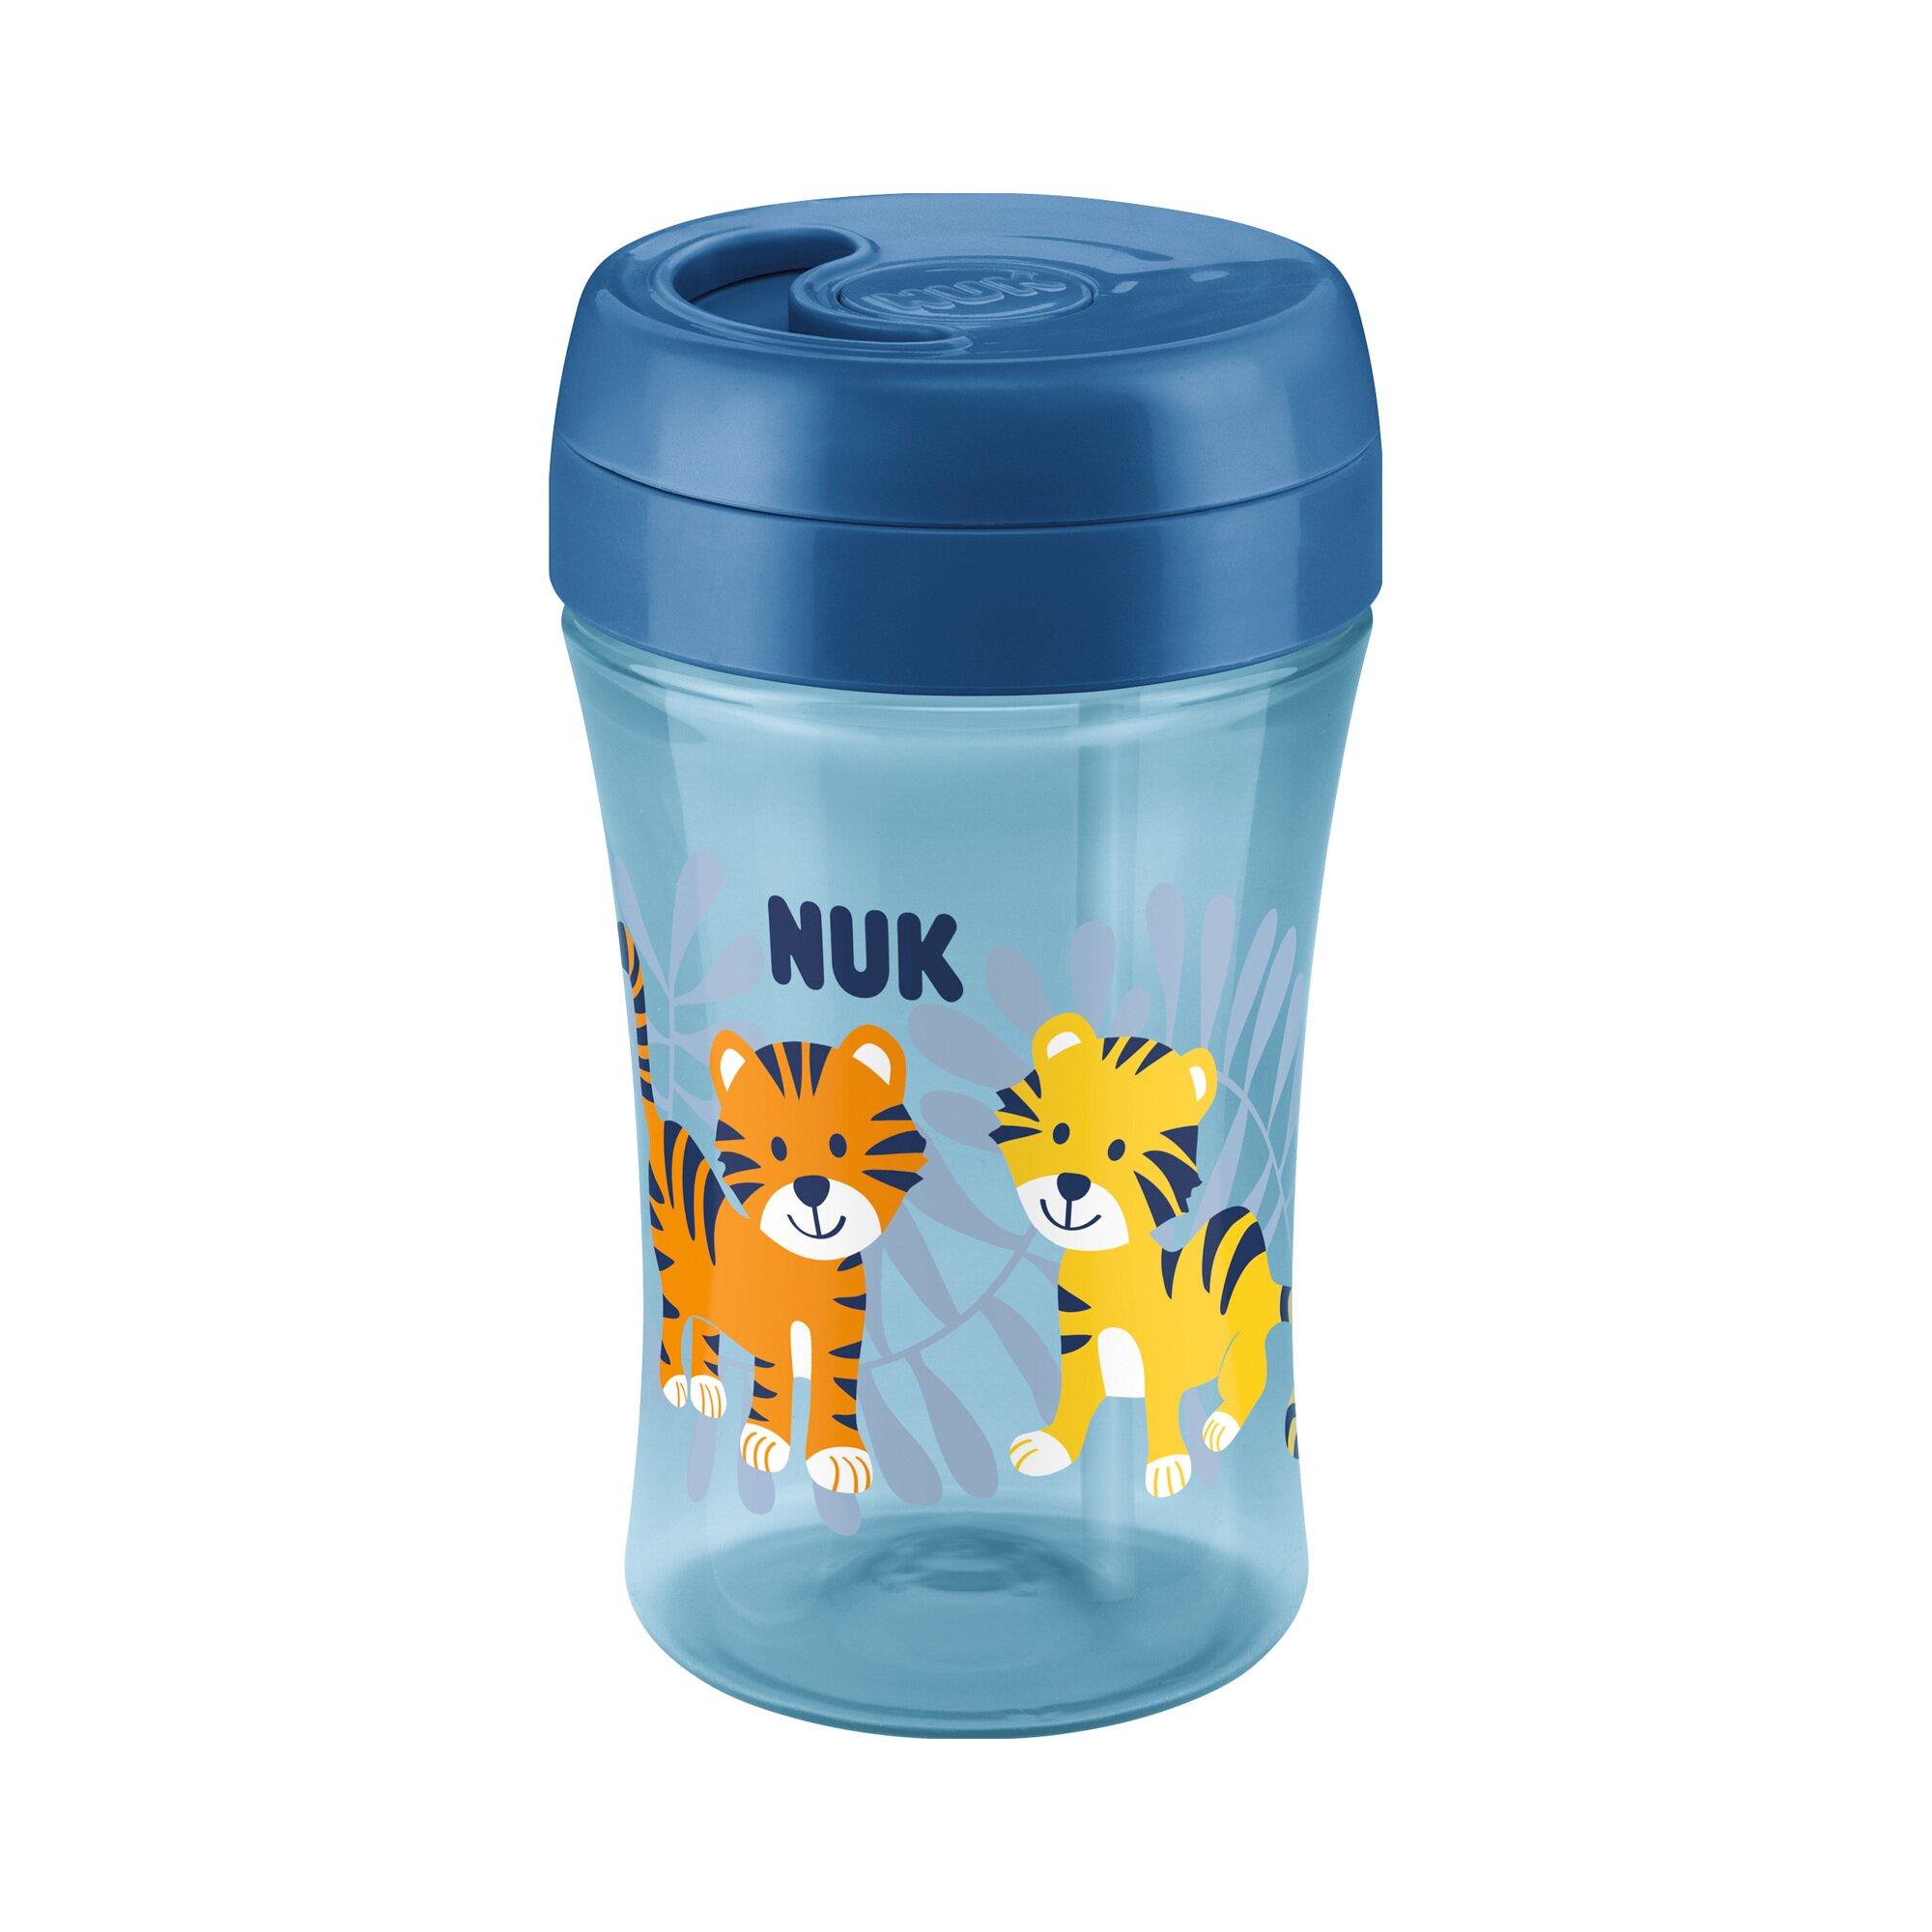 nuk-trinklernbecher-easy-learning-cup-fun-300ml-ab-18m